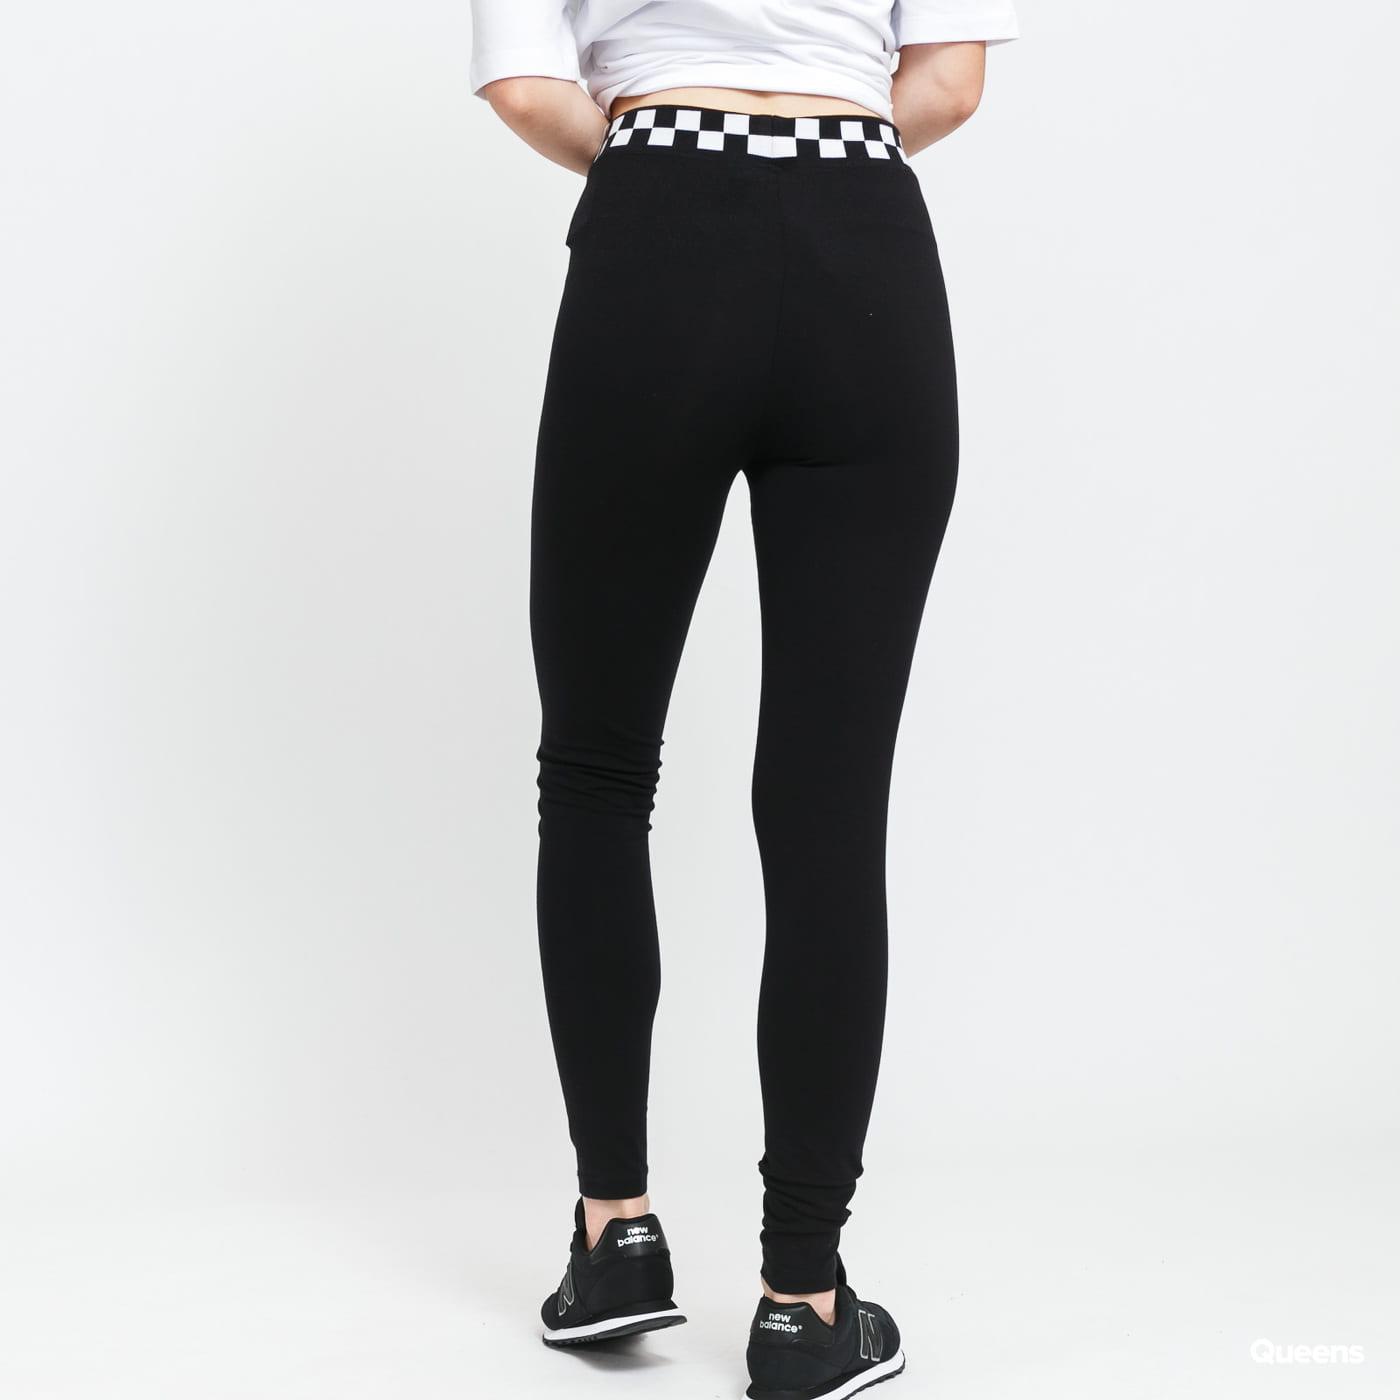 Vans WM Checkmate Legging black / white